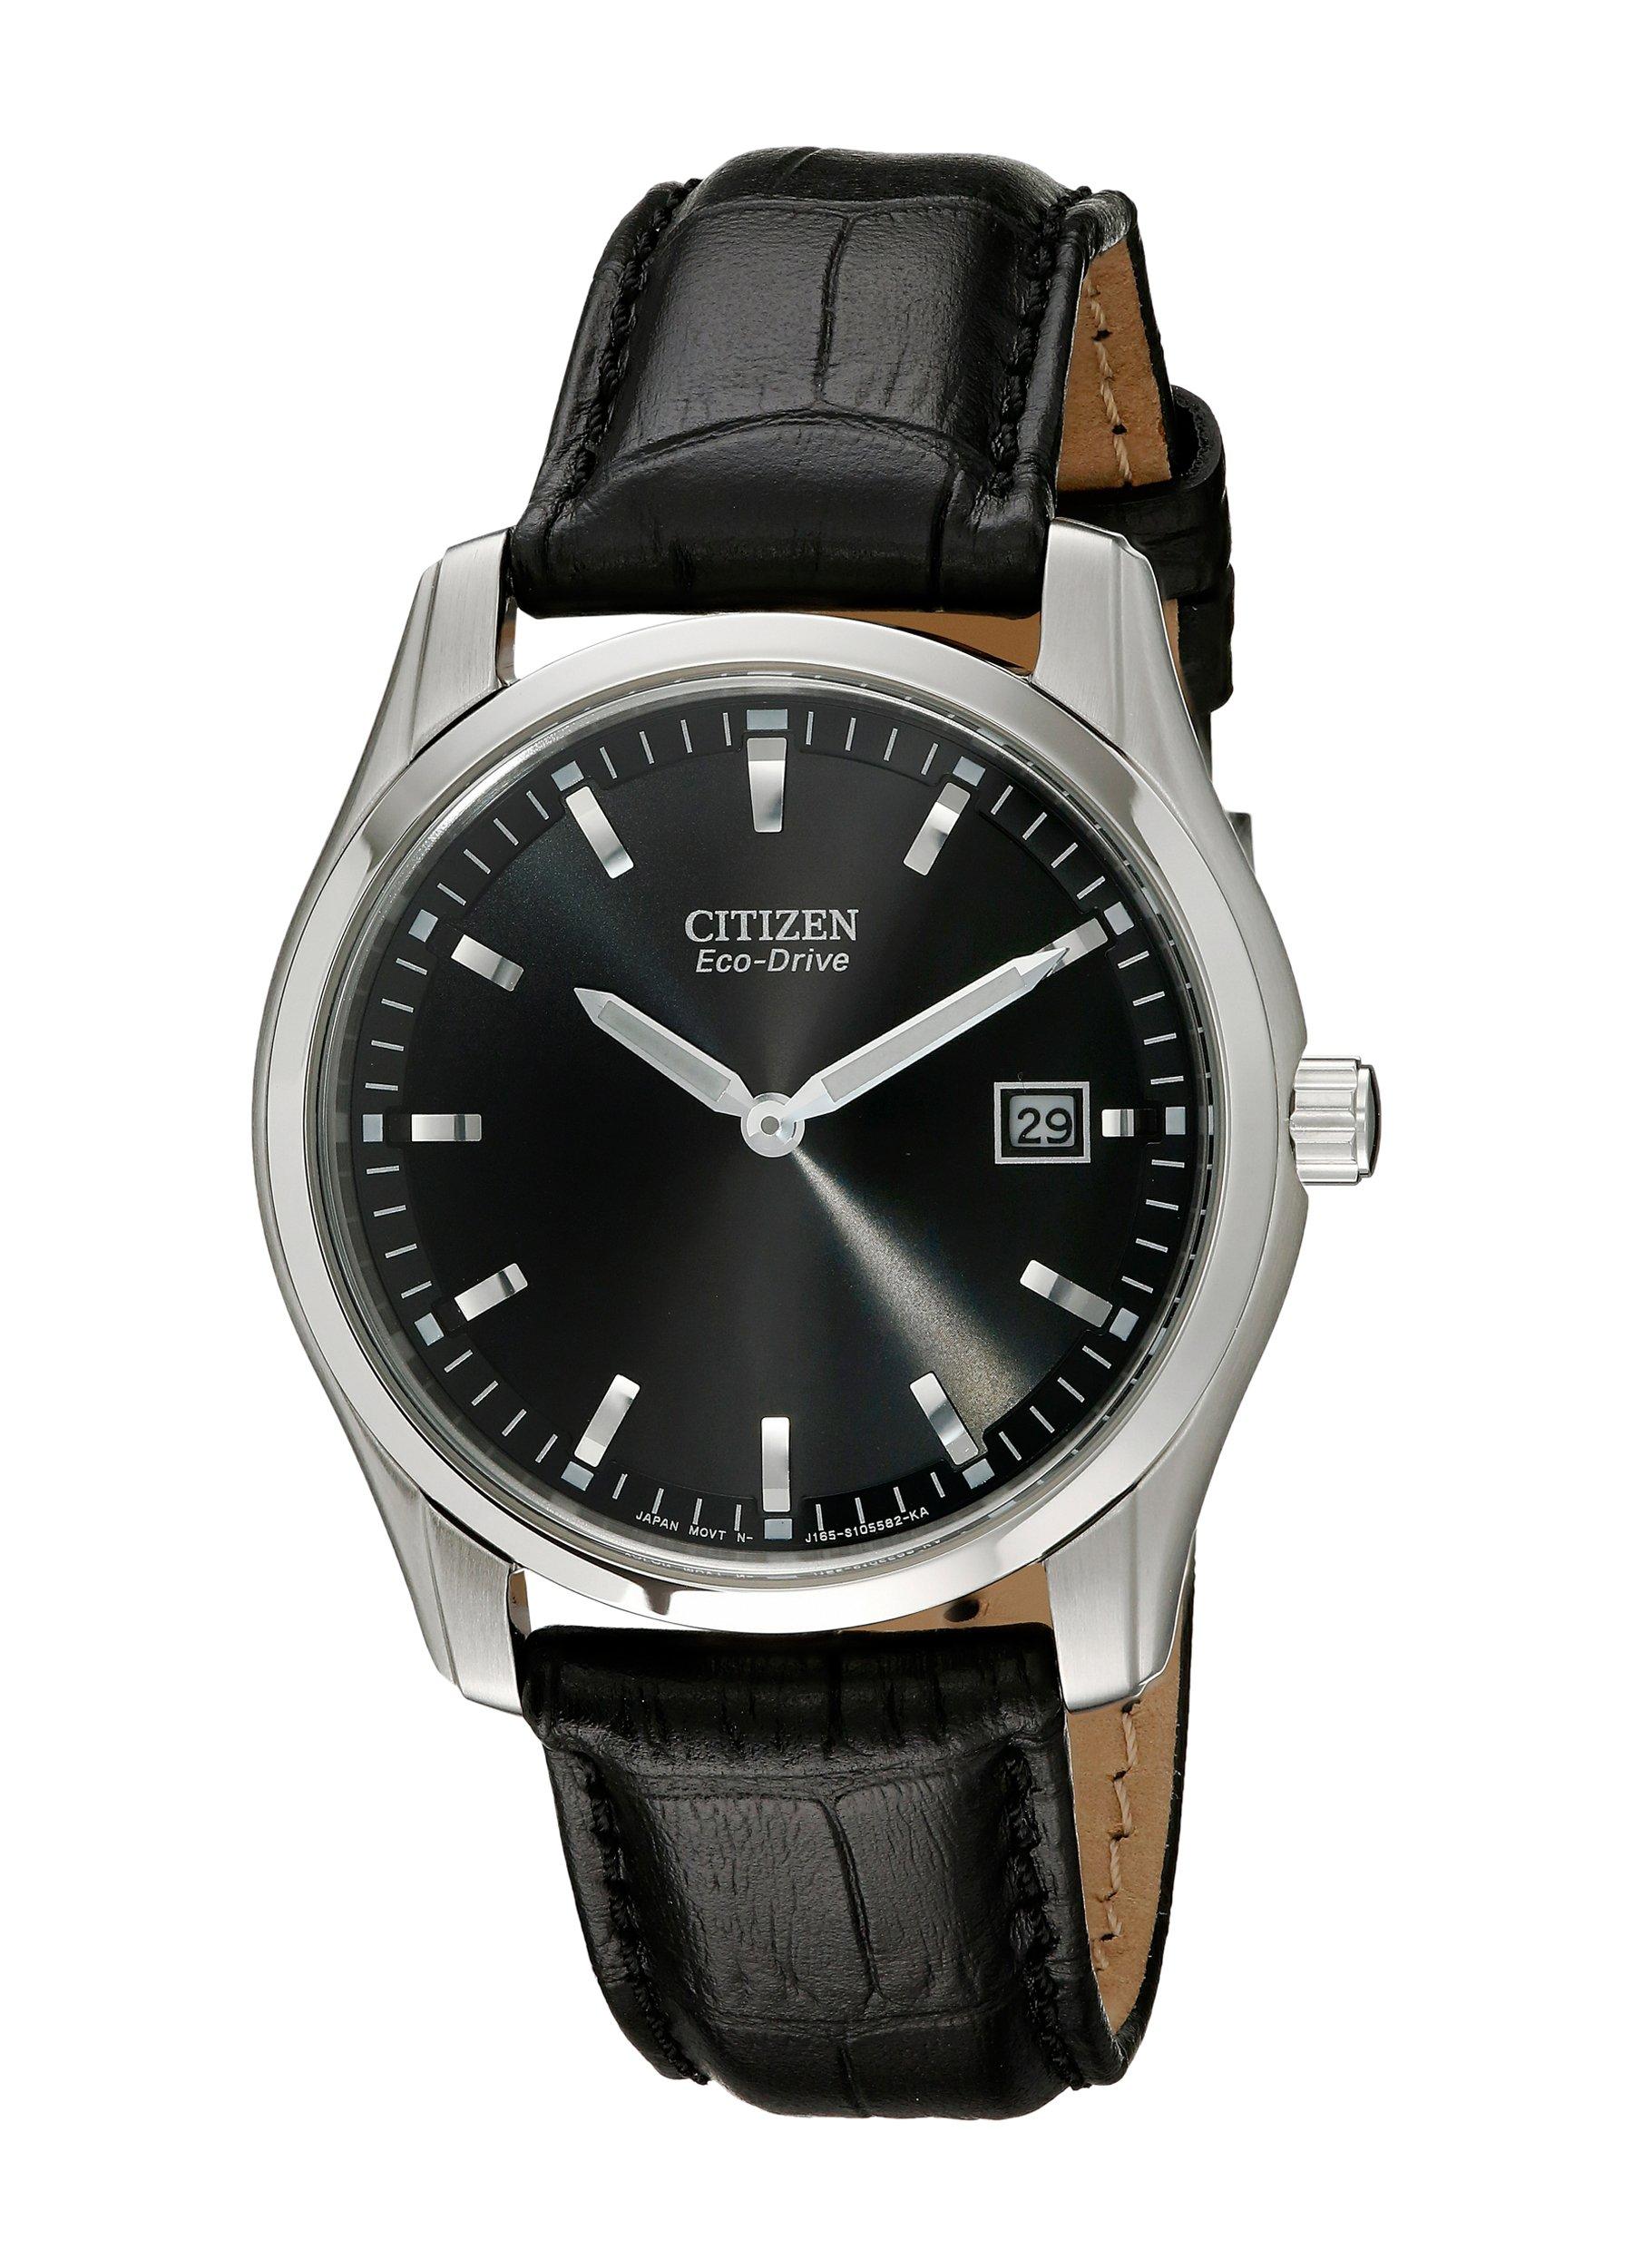 Citizen Men's Eco-Drive Stainless Steel Watch, AU1040-08E